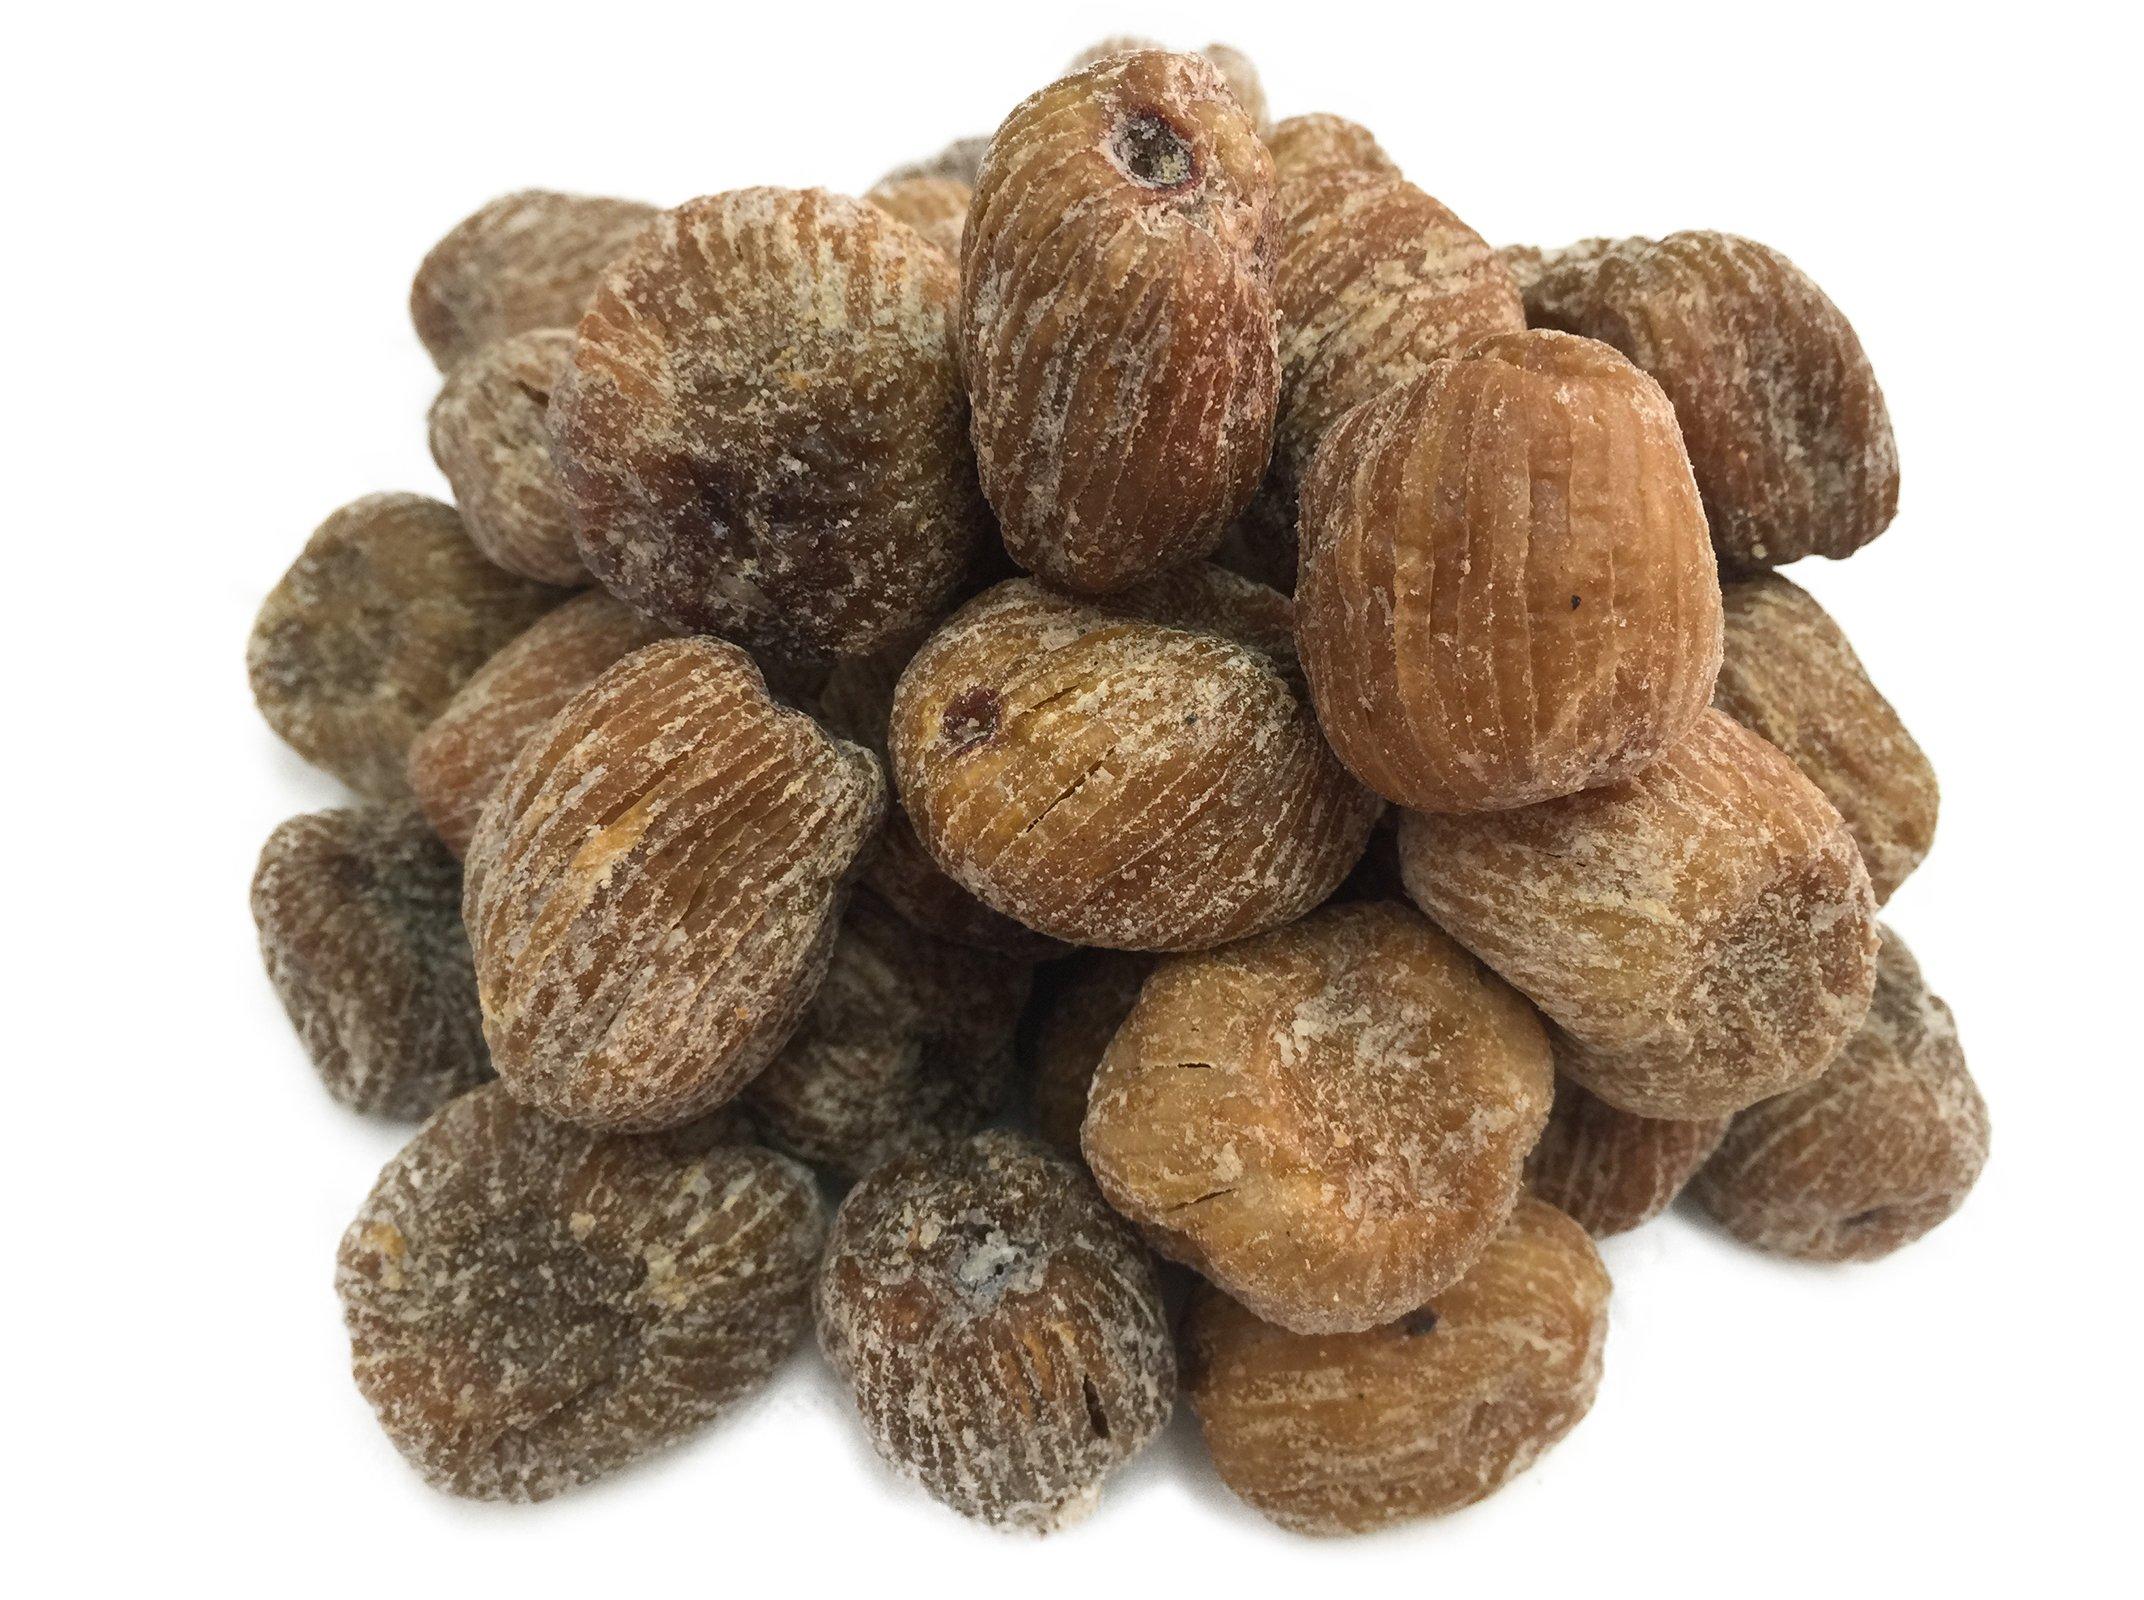 Candied Dates Honey Dates Mizao Sugar Dates Medjool 300g 蜜棗 蜜枣 Worldwide Free Airmail